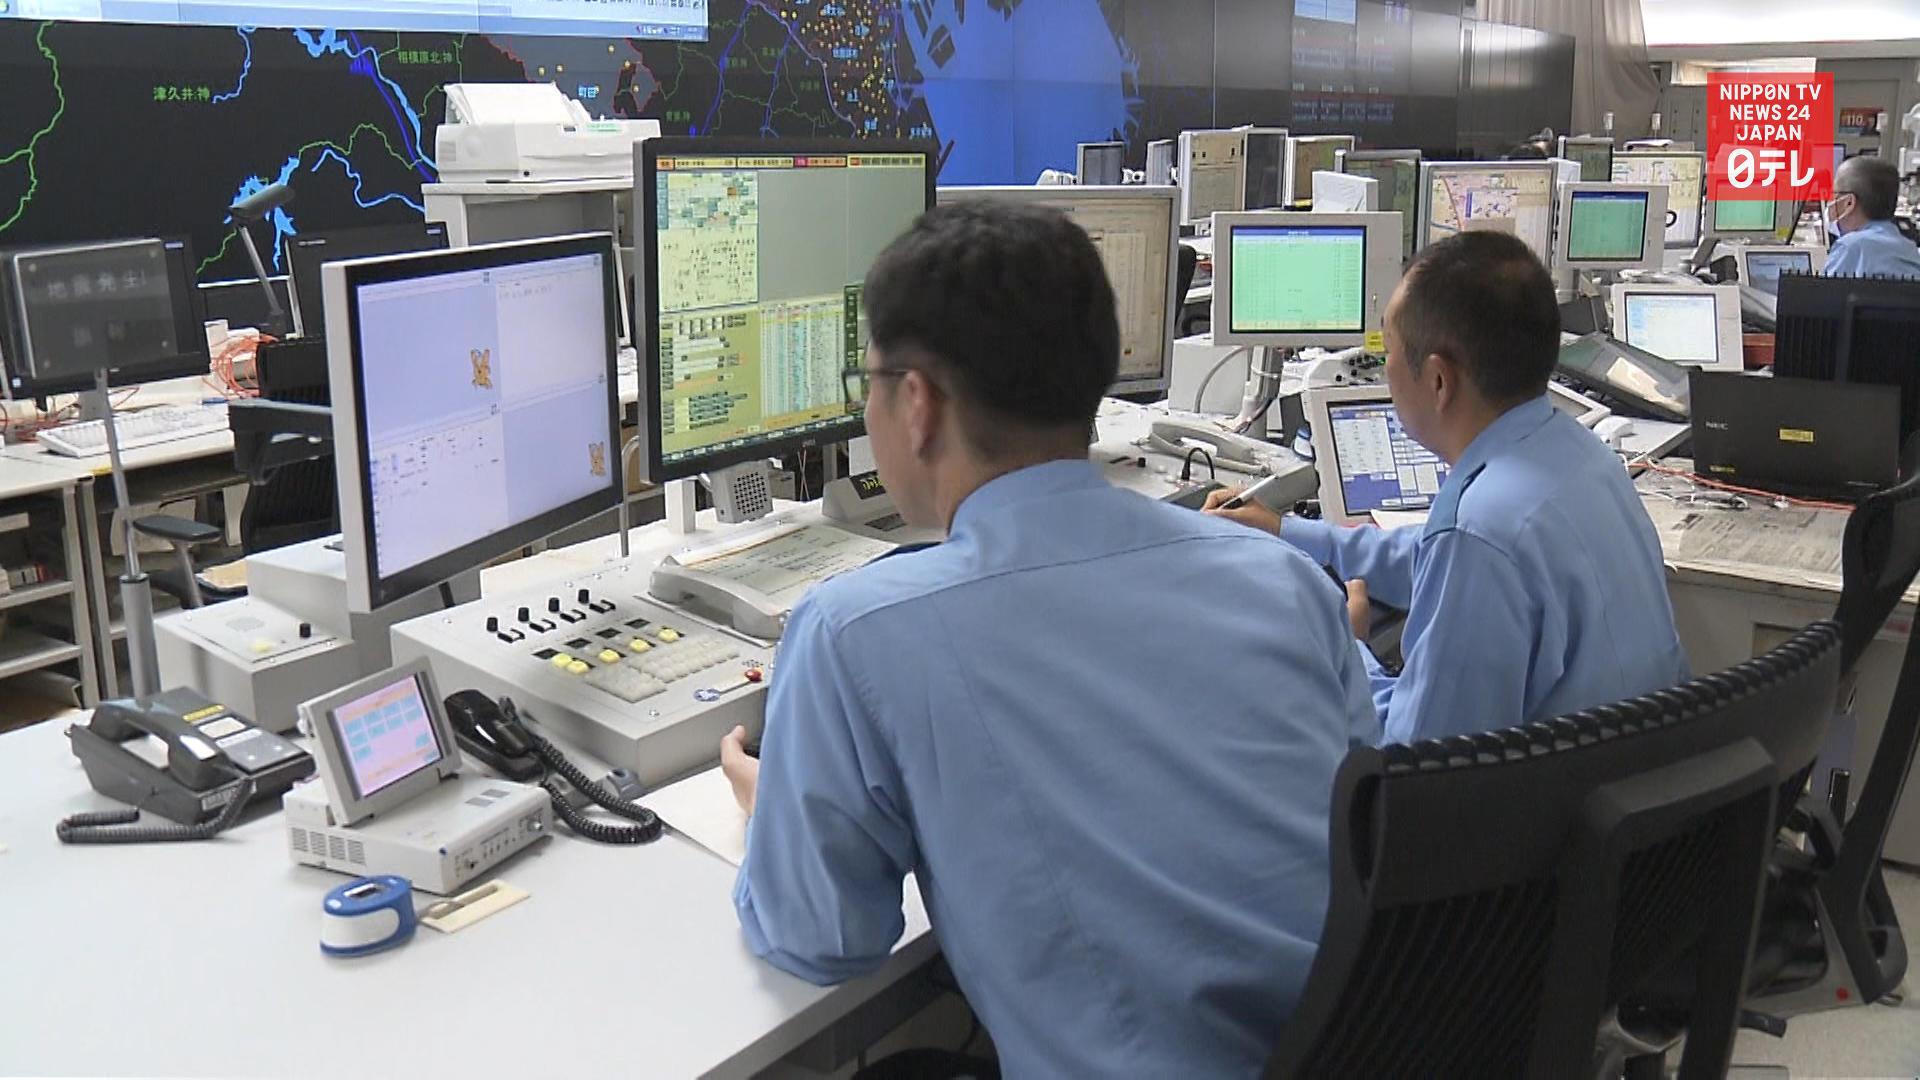 Emergency calls to Tokyo police spike over coronavirus